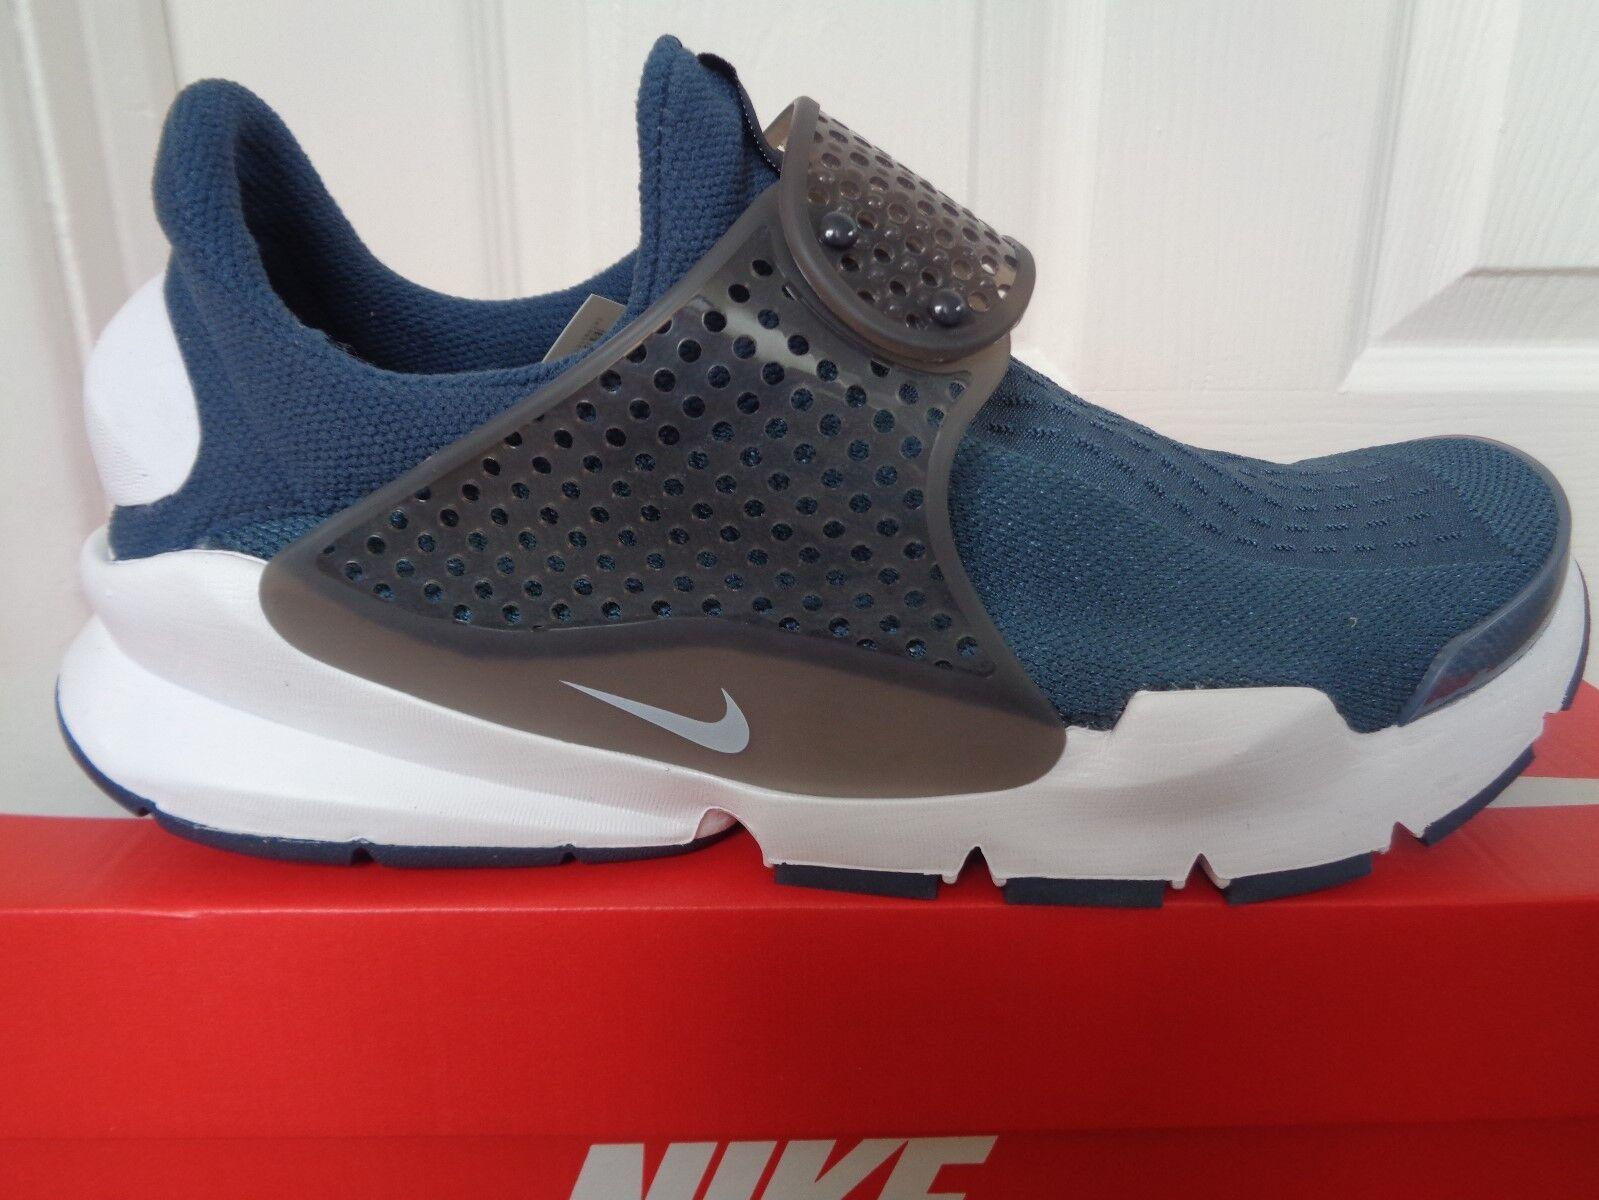 Nike Sock schuhe Dart KJCRD trainers Turnschuhe schuhe Sock 819686 404 uk 7 eu 41 us 8 NEW+BOX 458617